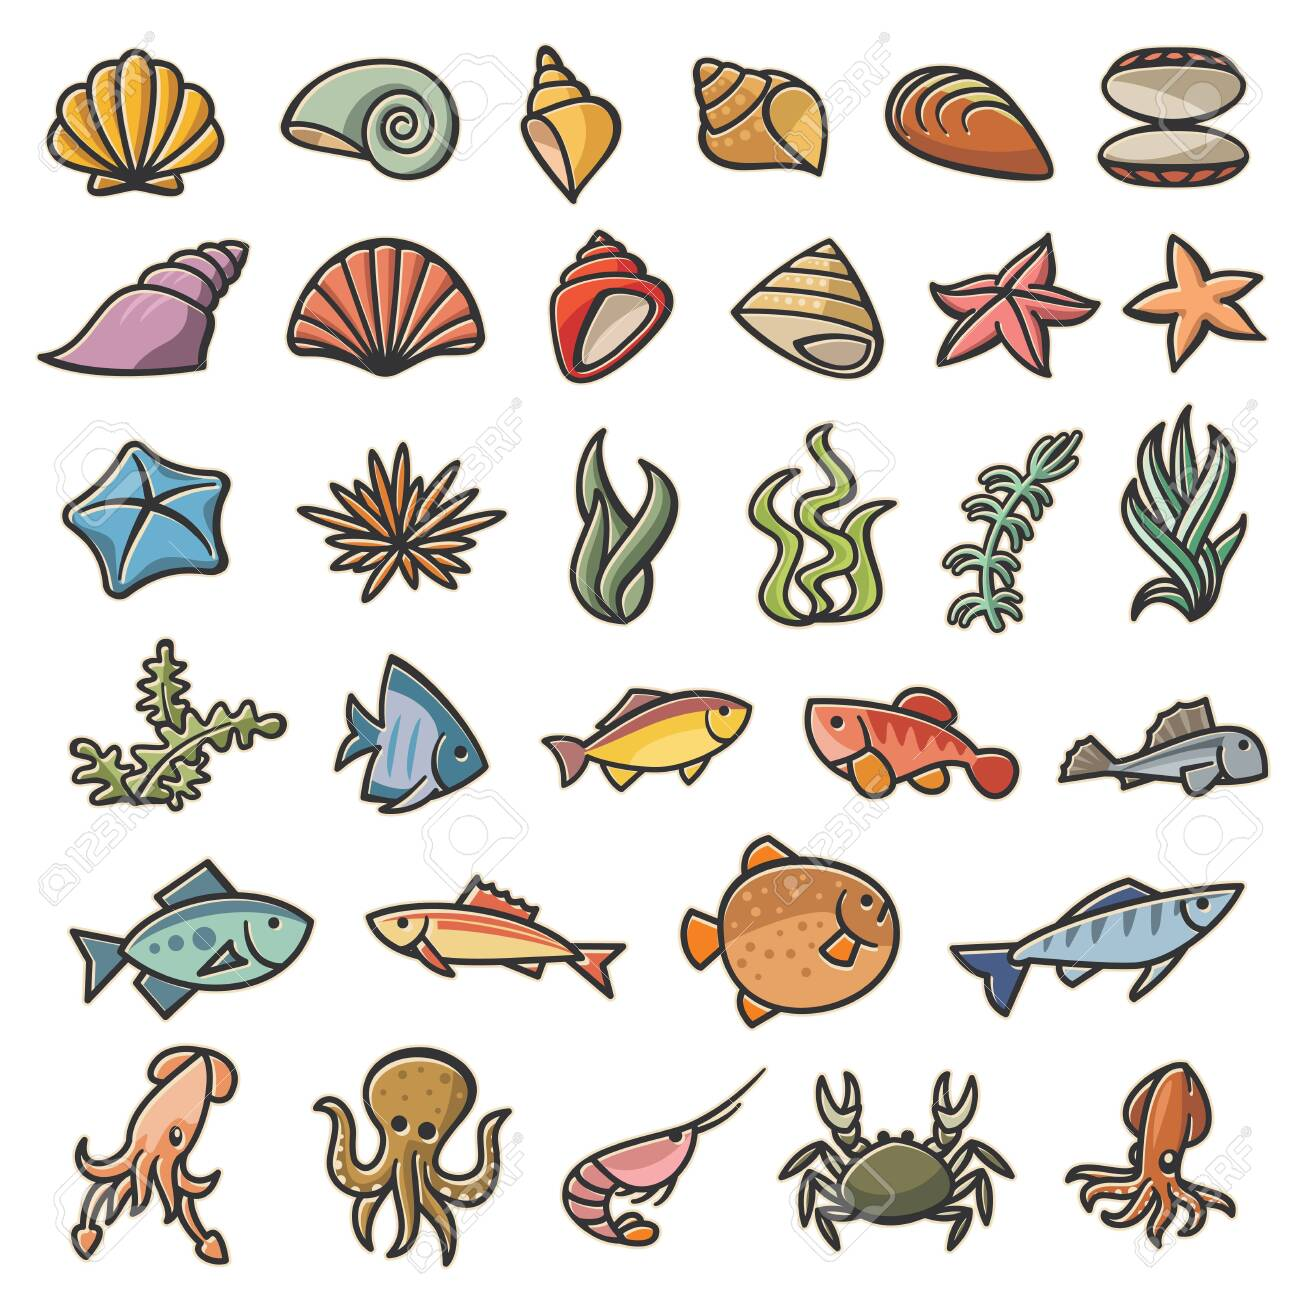 Marine sea symbols colorful set of 32 images - 143617206